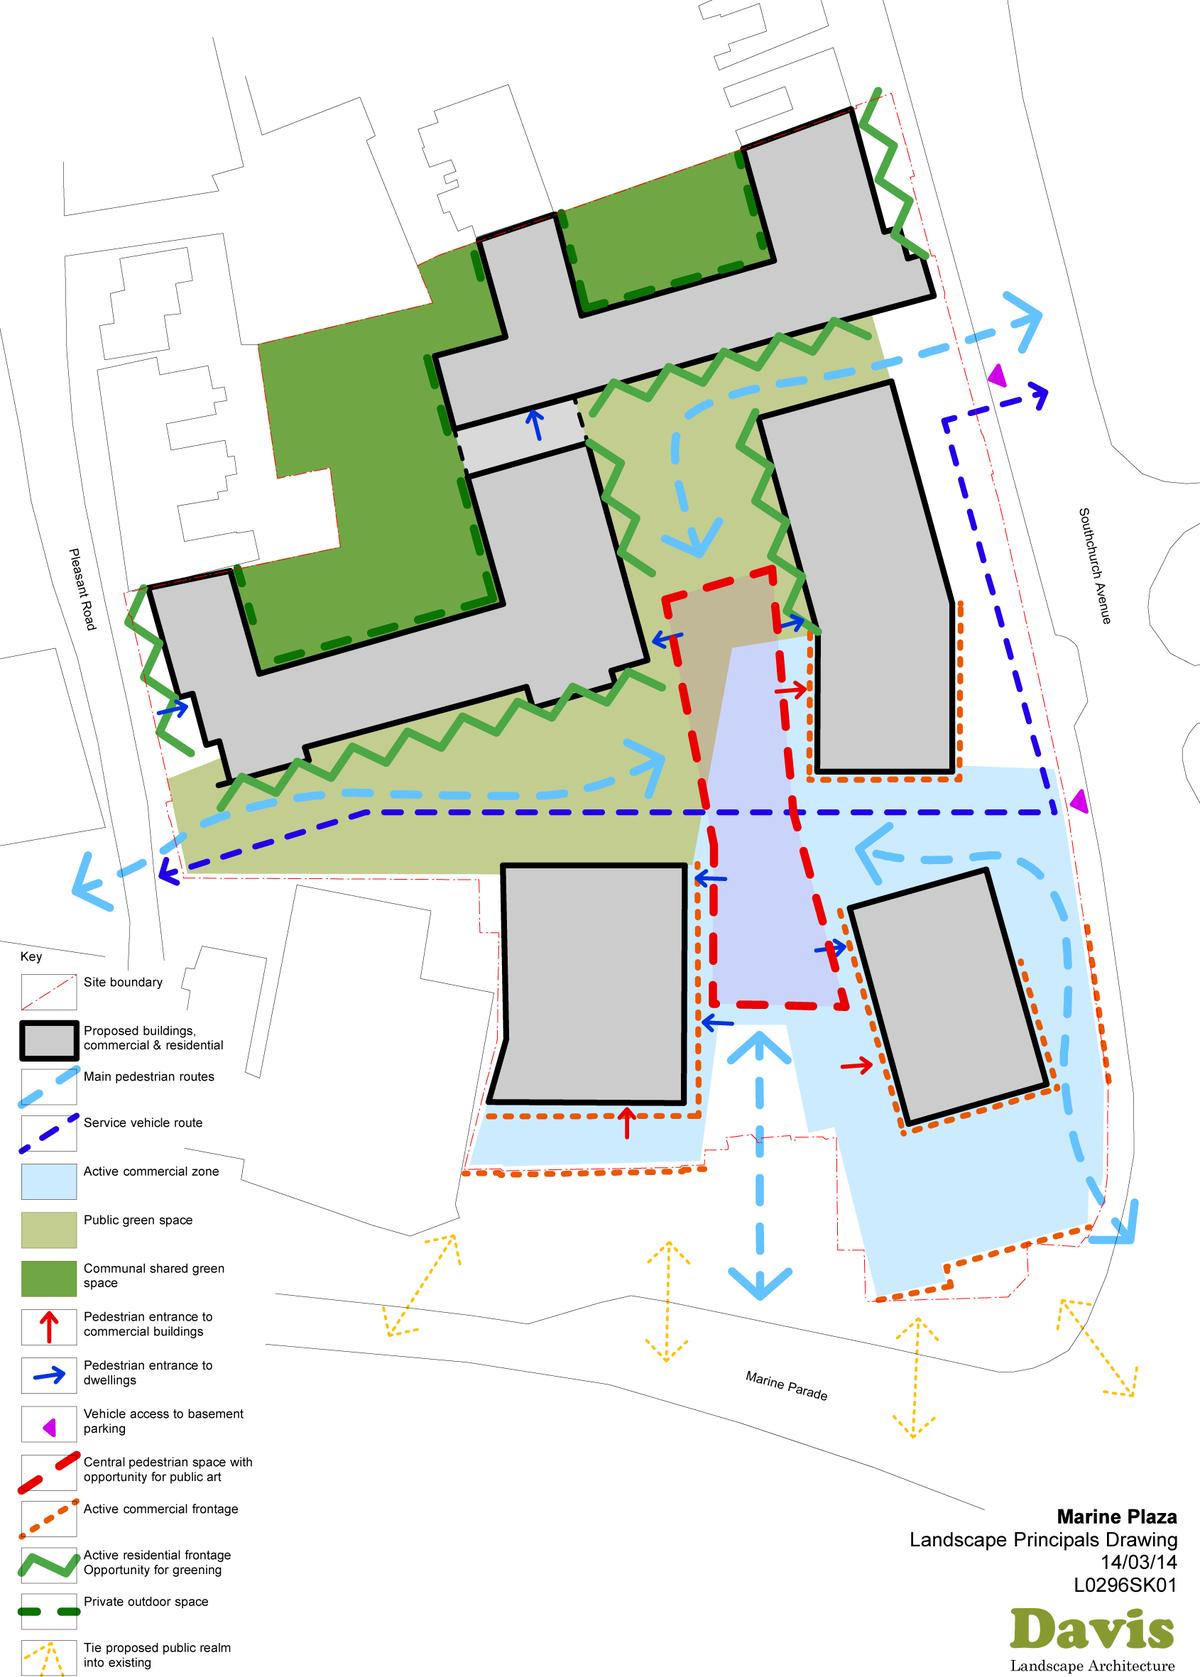 Marine Plaza Mixed Use Landscape Landscape Principals